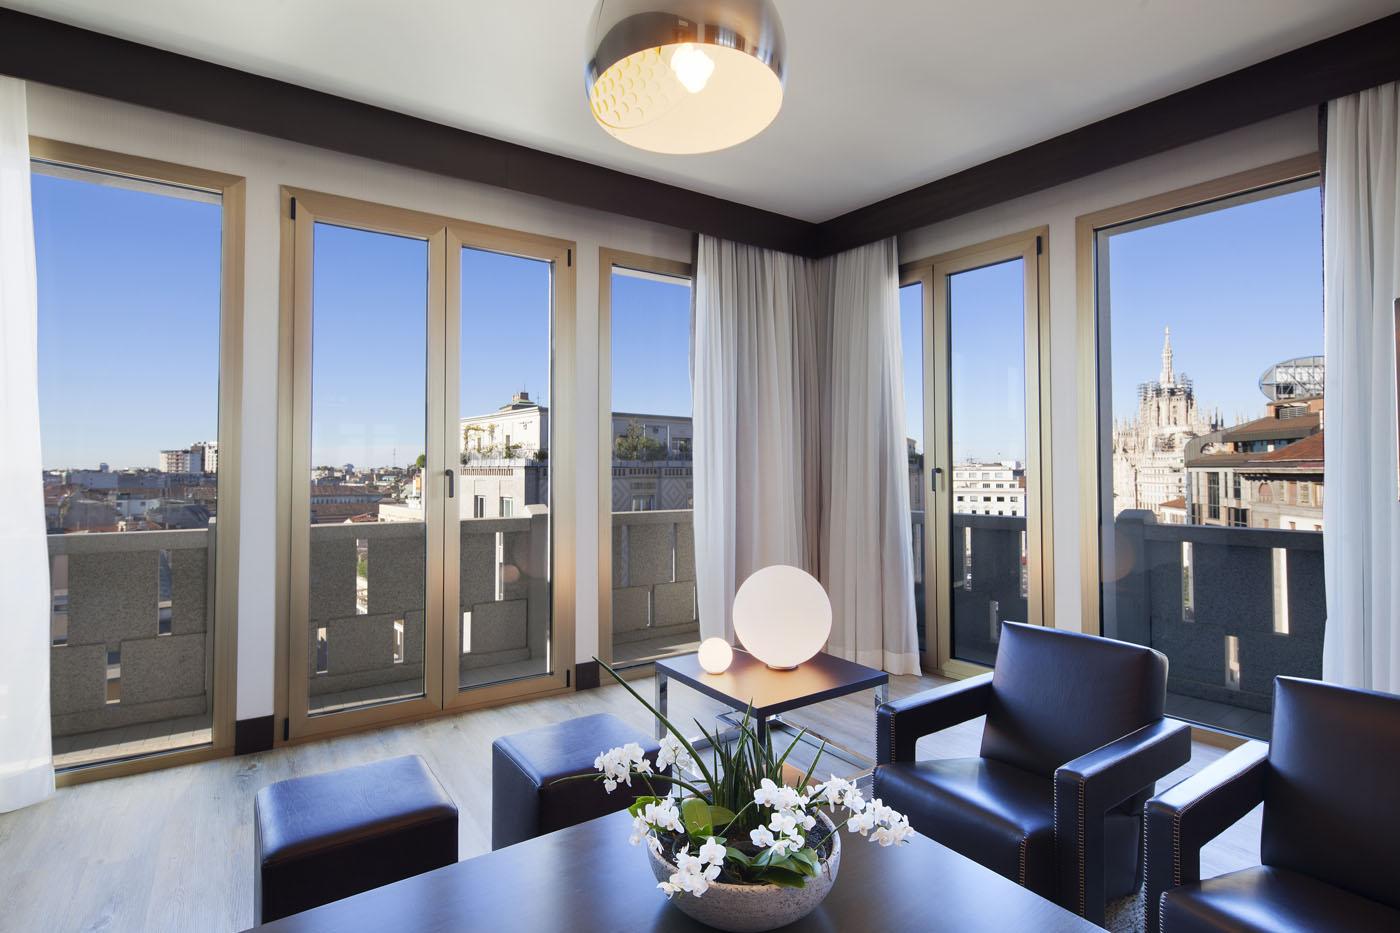 servizio_fotografico_meeting_room_hotel_milano